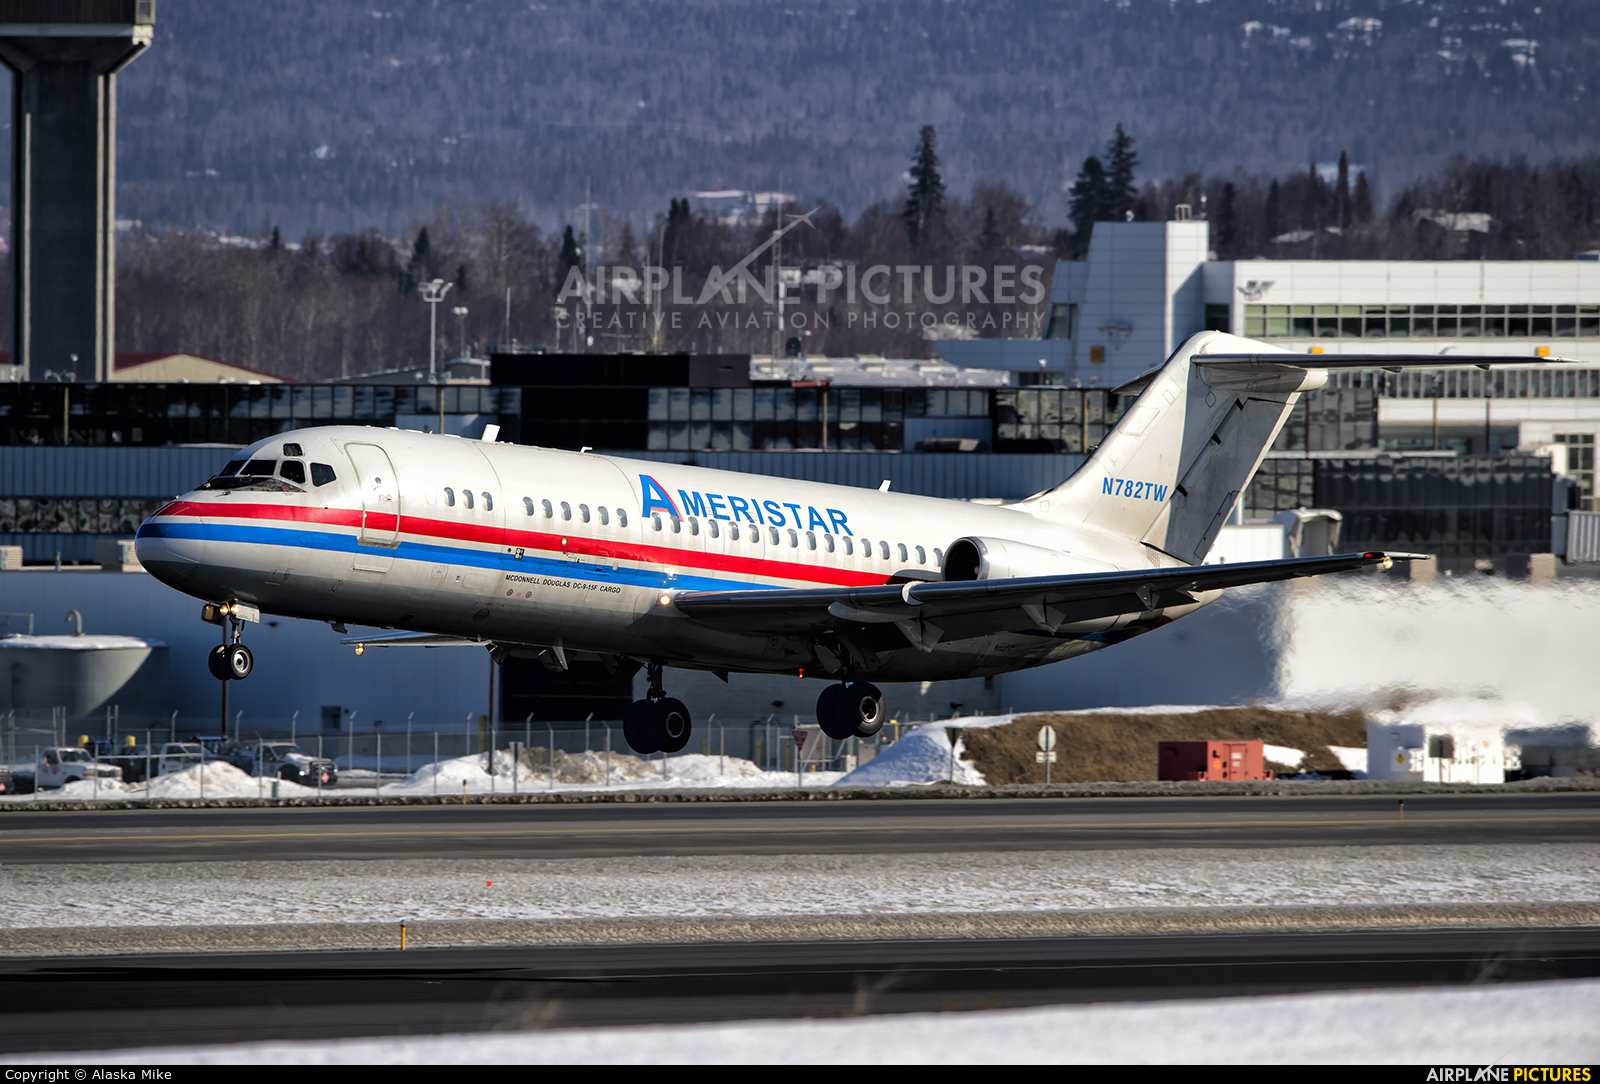 Ameristar Air Cargo N782TW aircraft at Anchorage - Ted Stevens Intl / Kulis Air National Guard Base